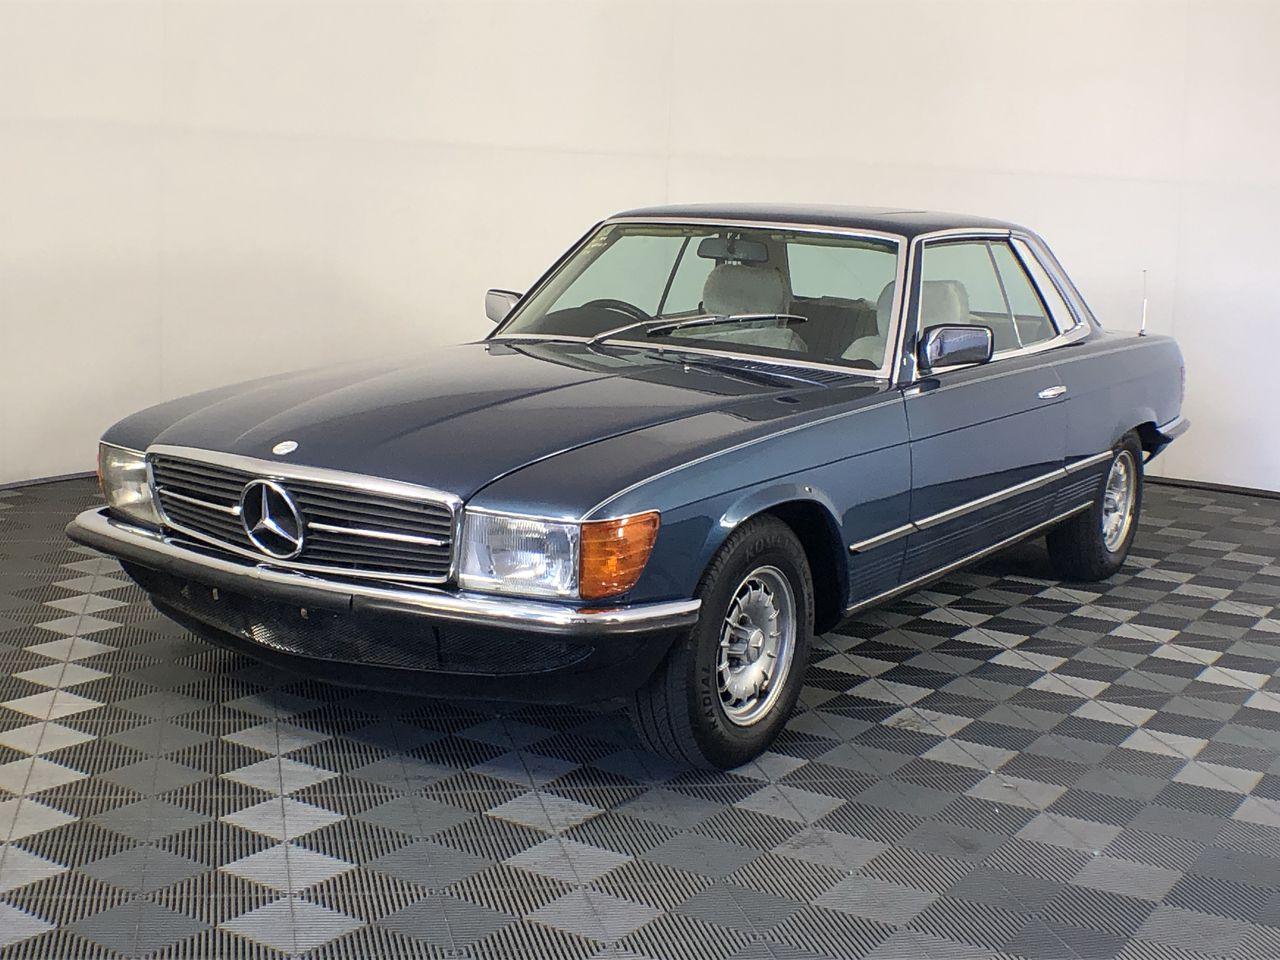 Mercedes 450 SLC Automatic Coupe